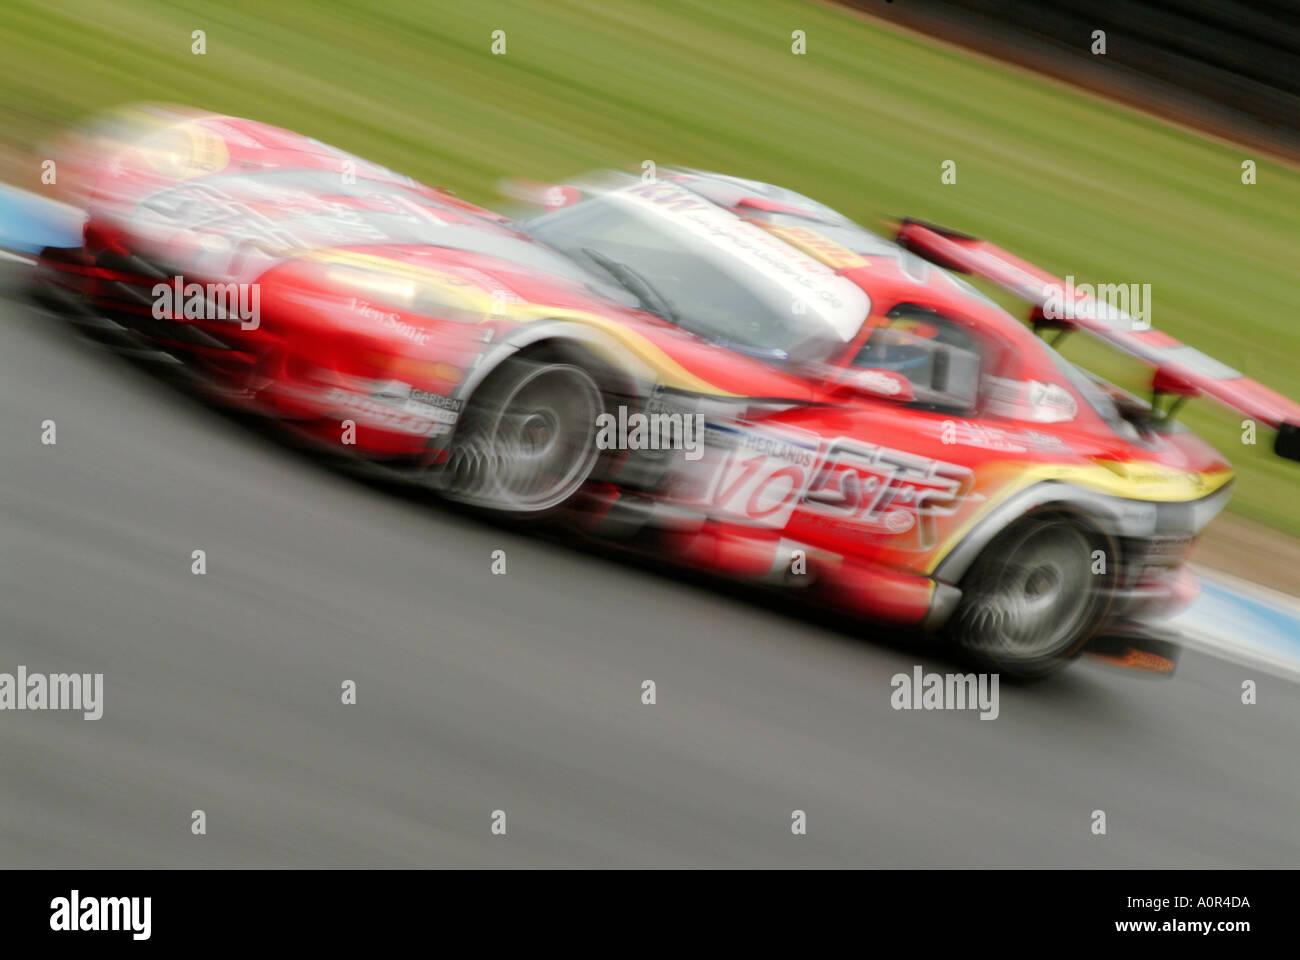 Dodge Viper Racing Car Race Motor Sport Auto Risk Win Lose Fast